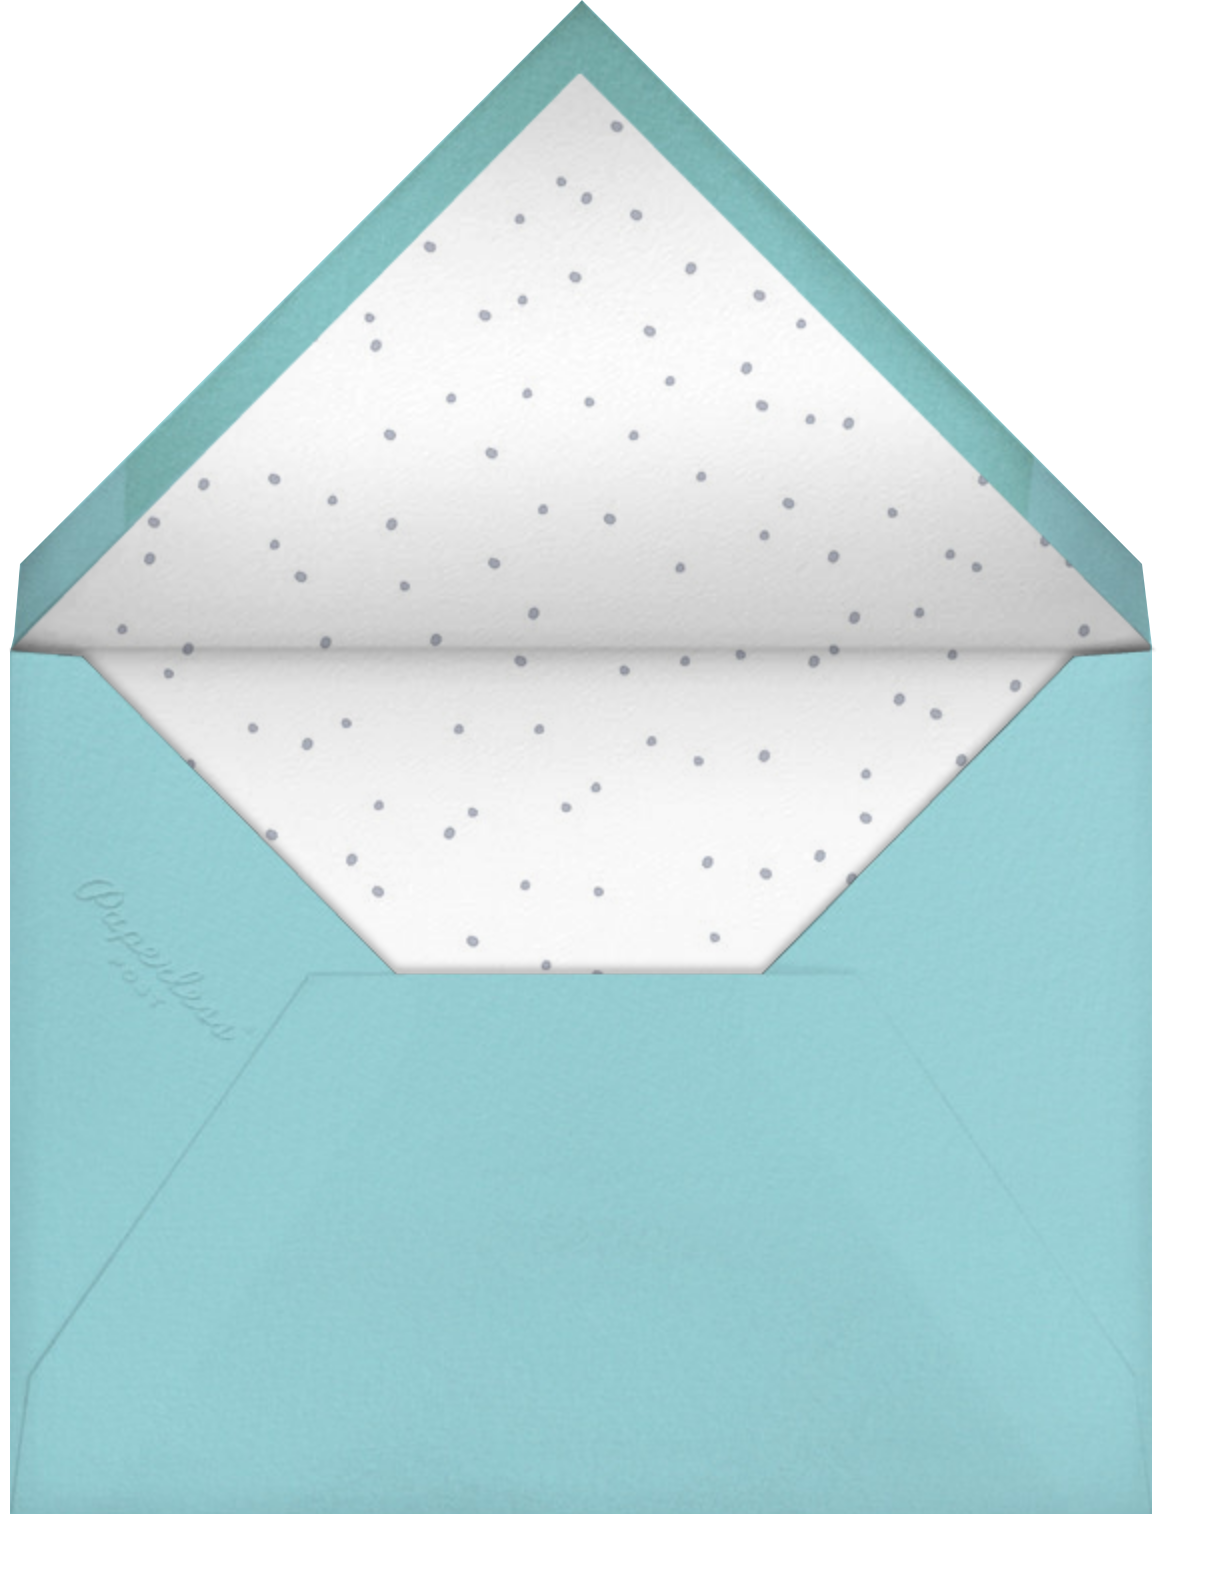 Birdie's Town (Horizontal) - Little Cube - Housewarming - envelope back